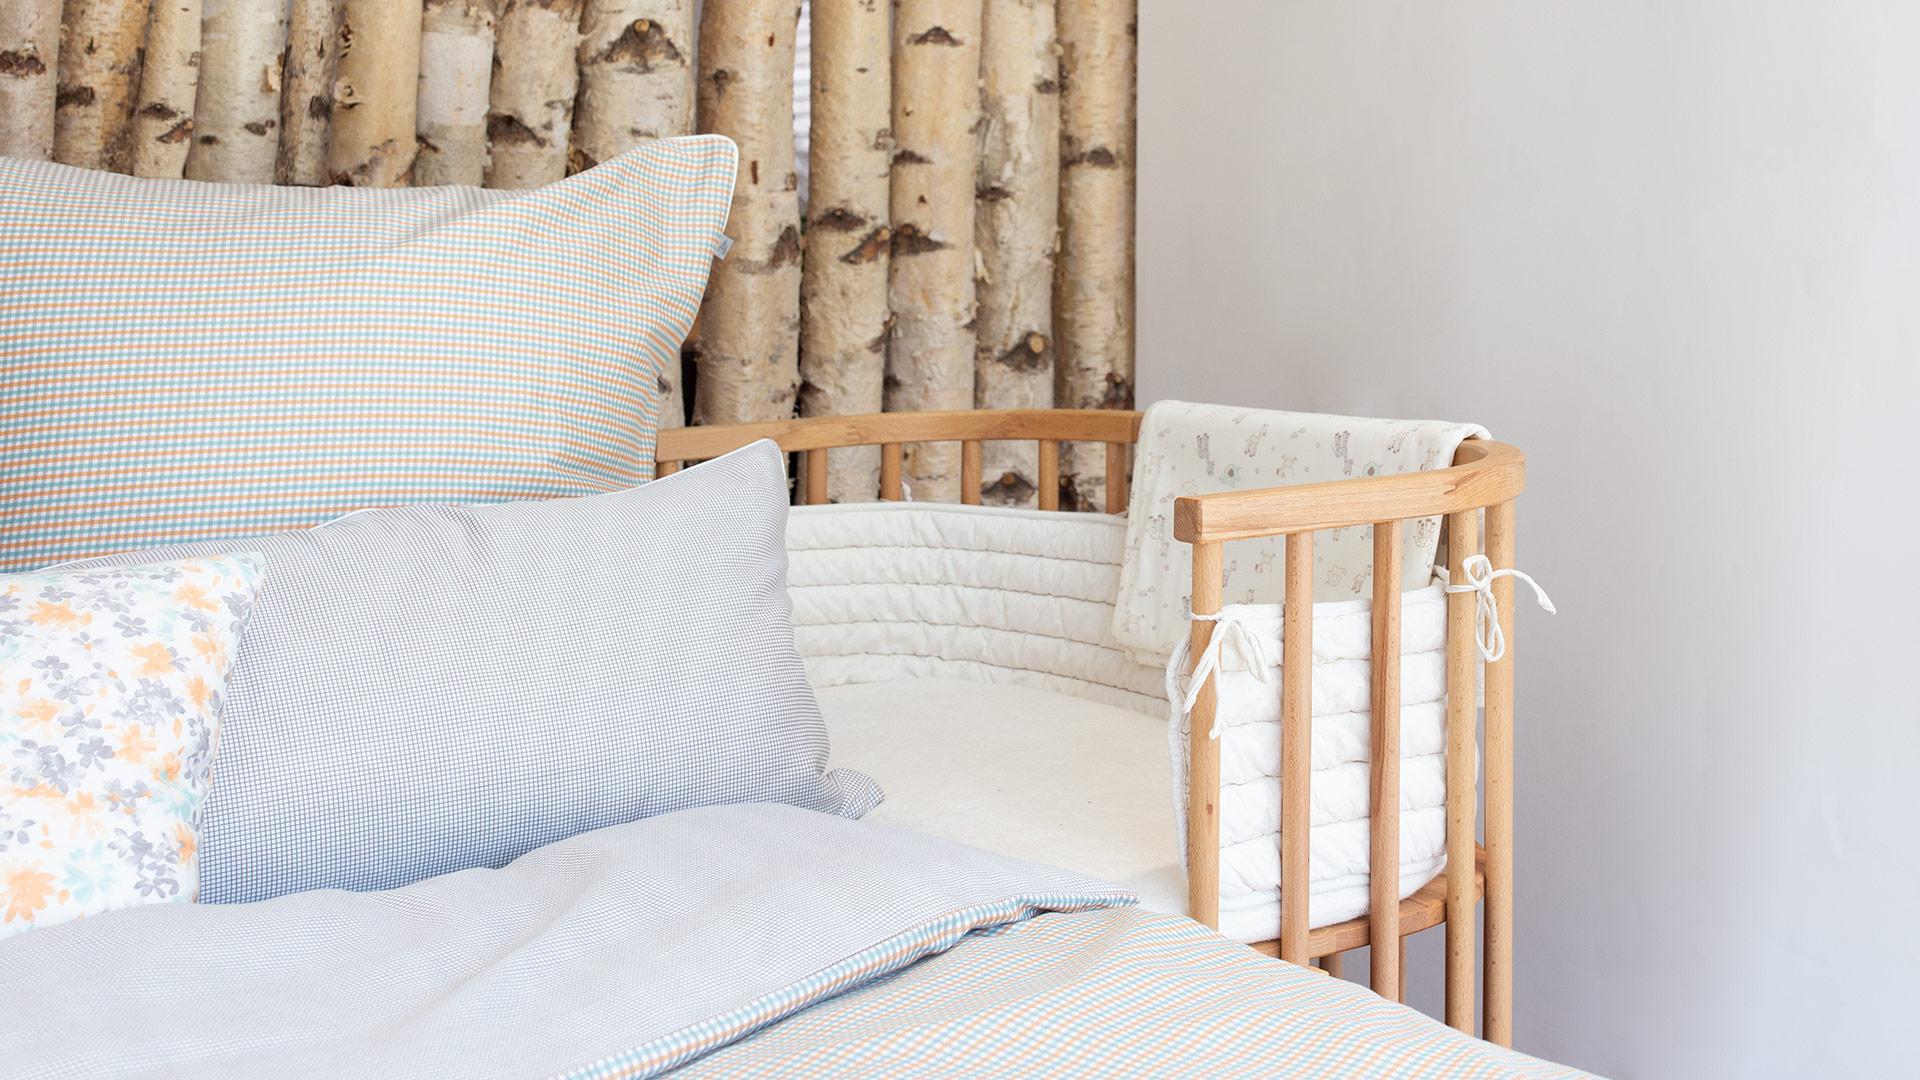 Beistellbett Piccino By Babybay